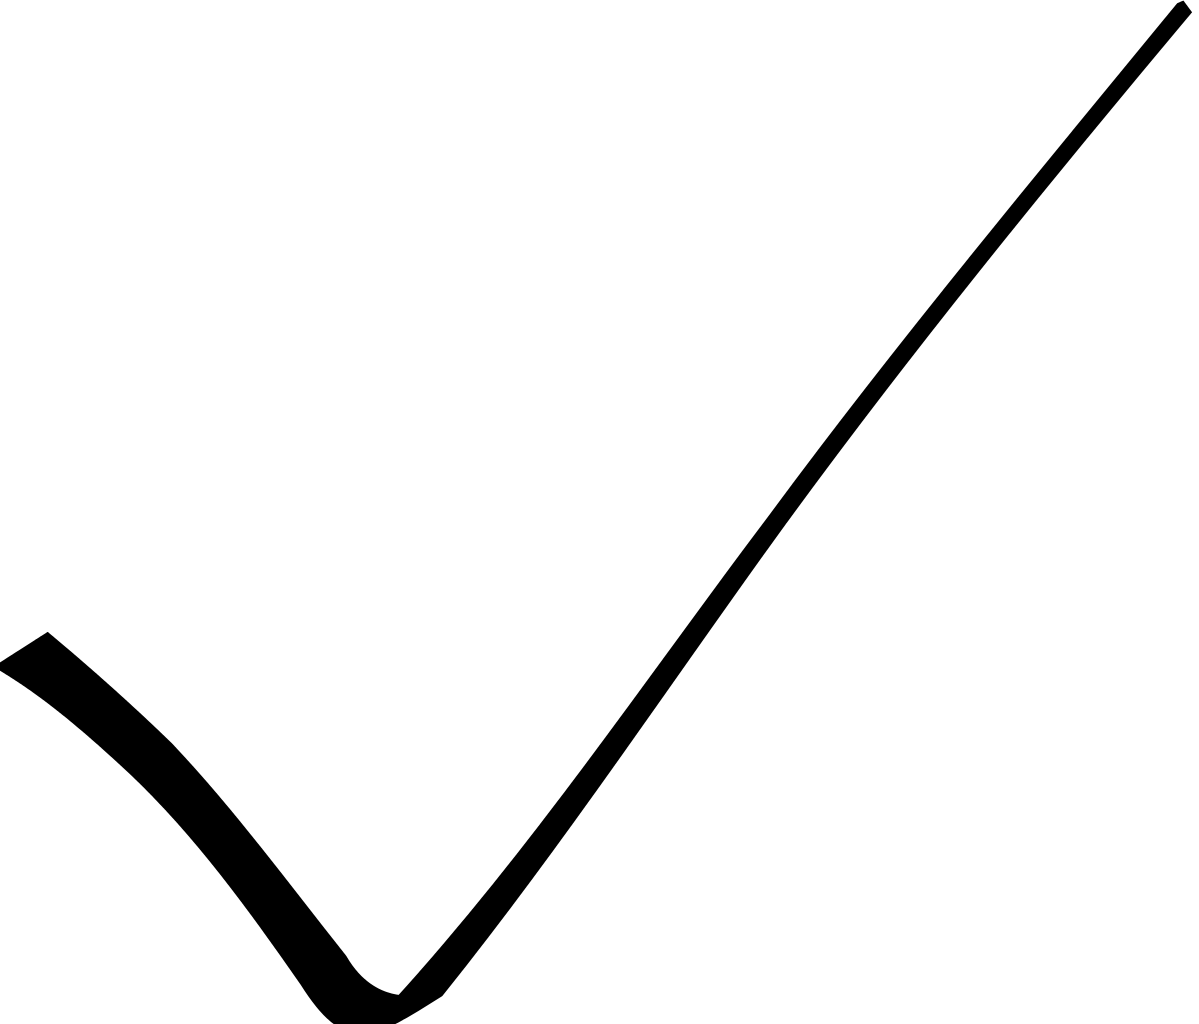 Free Black Check Mark, Download Free Clip Art, Free Clip Art.